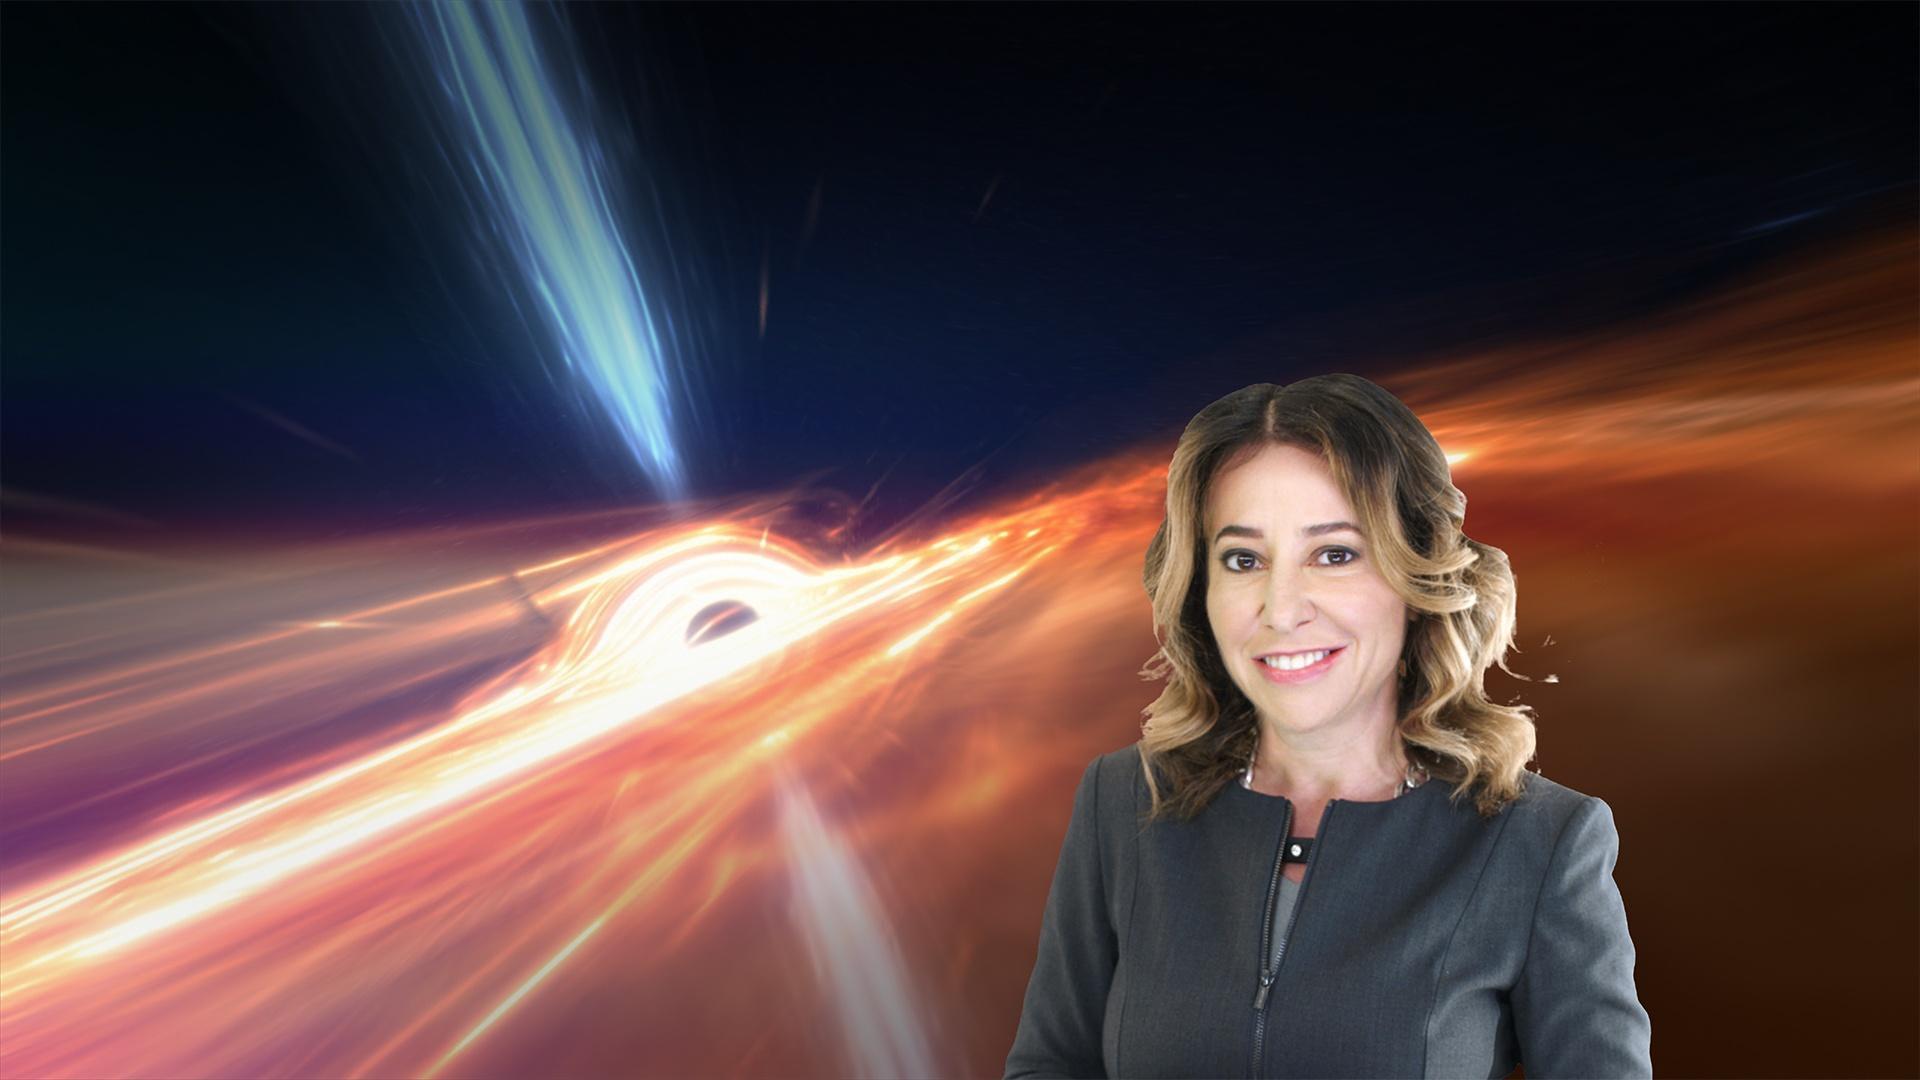 S45 E1 Black Hole Apocalypse Watch Nova Pbs Full Episodes